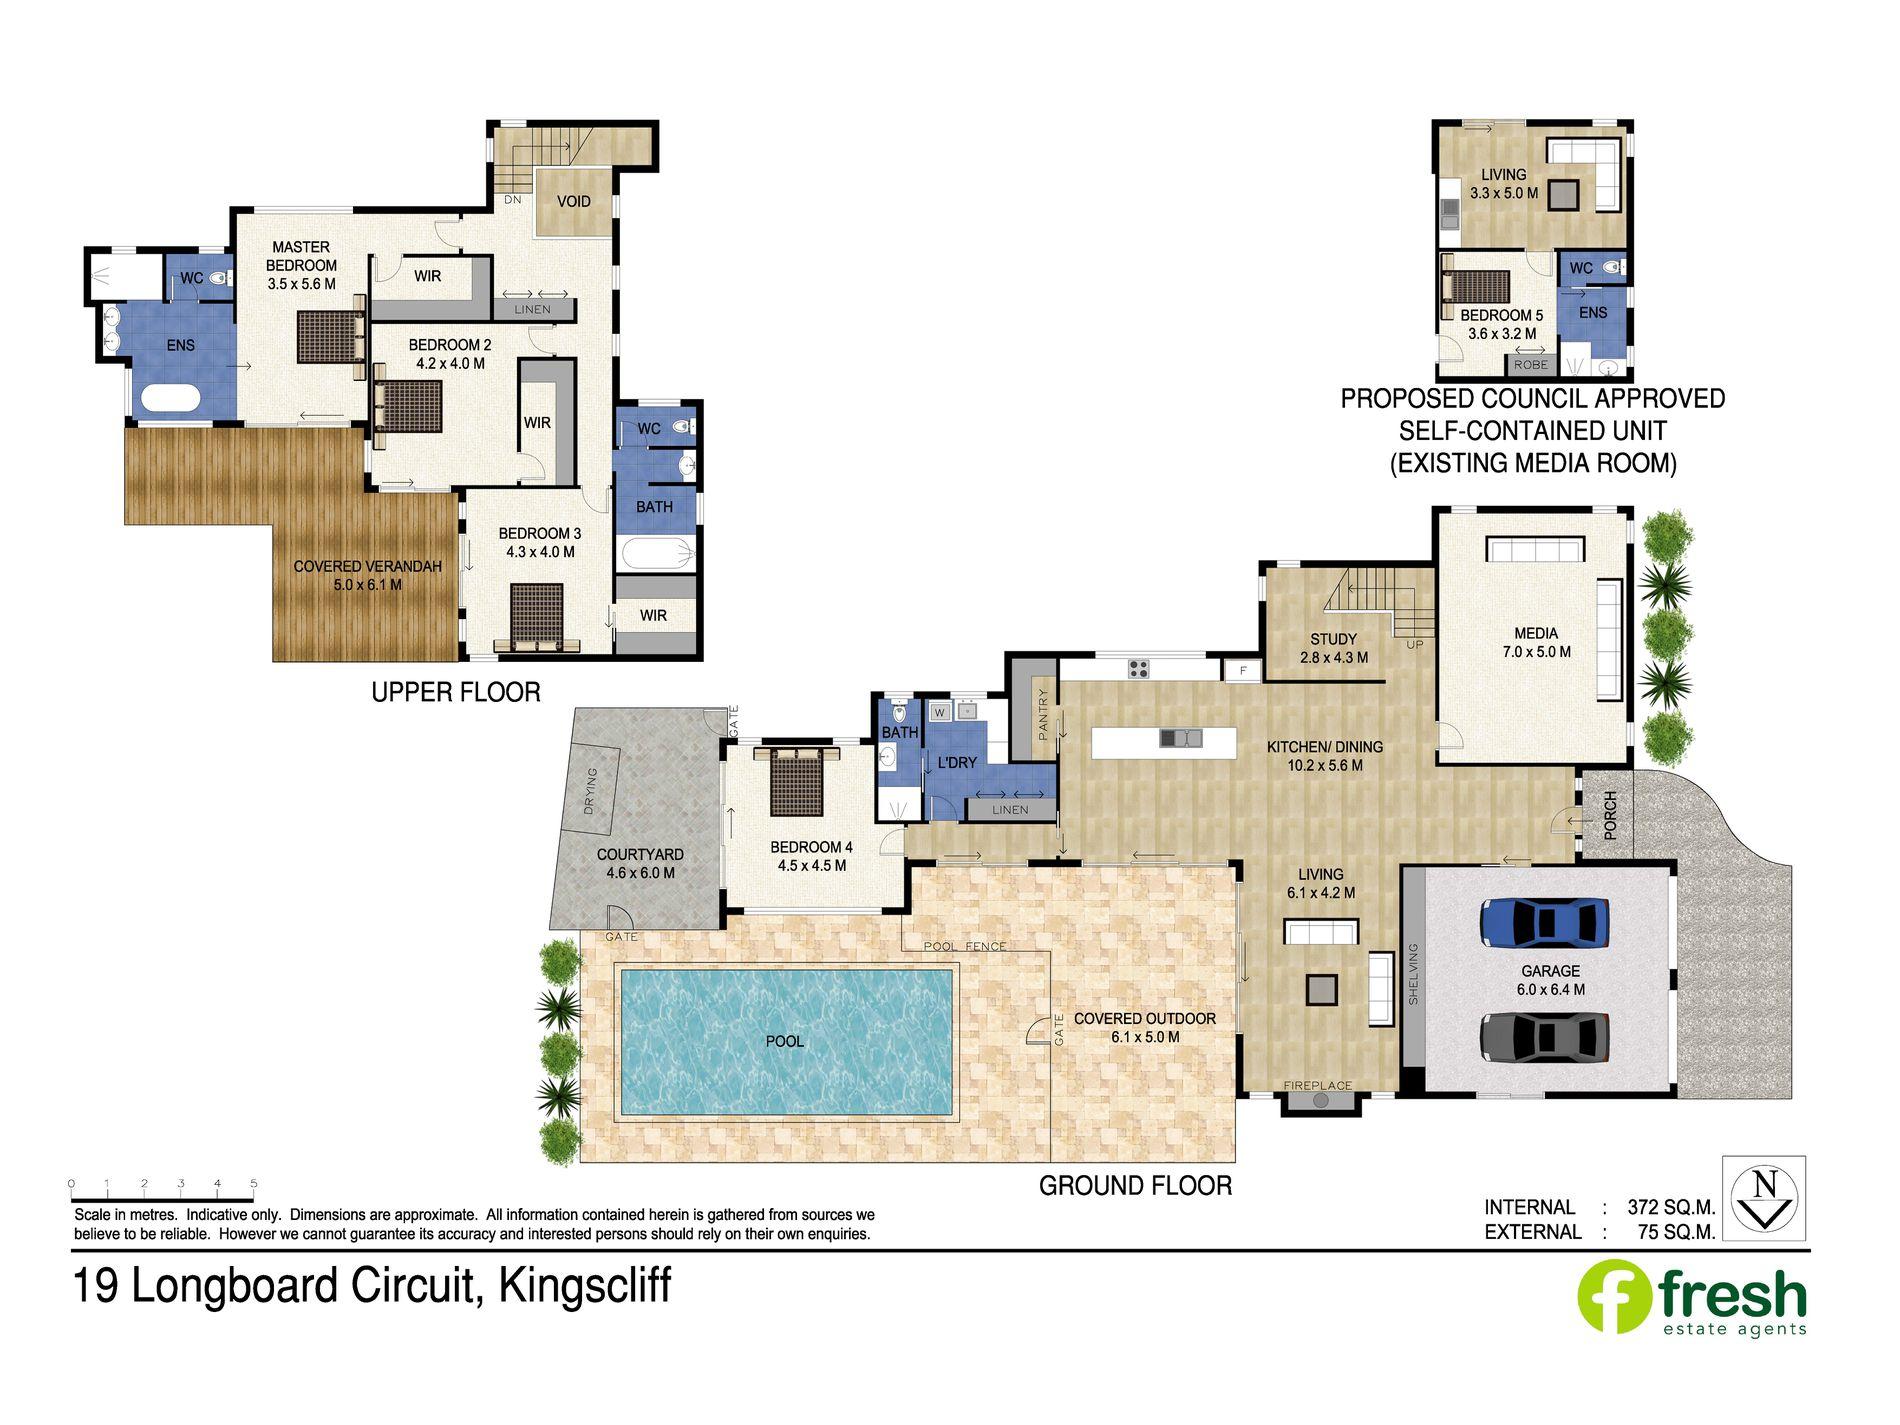 19 Longboard Circuit, Kingscliff